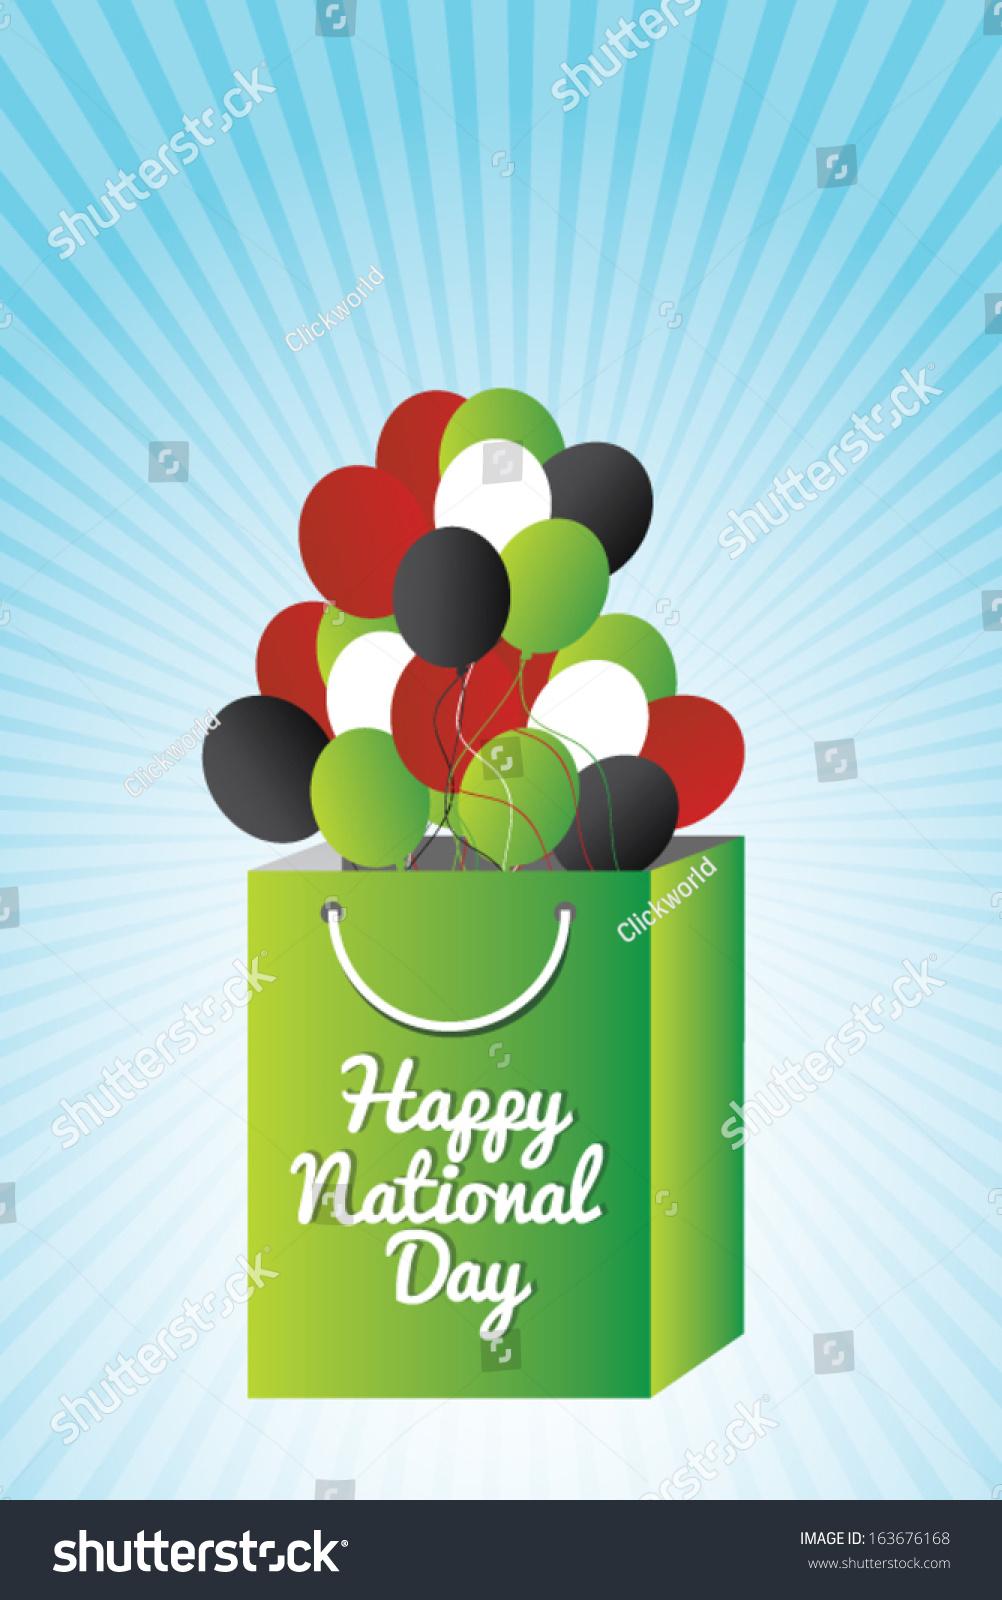 Uae national day greetings stock vector royalty free 163676168 uae national day greetings m4hsunfo